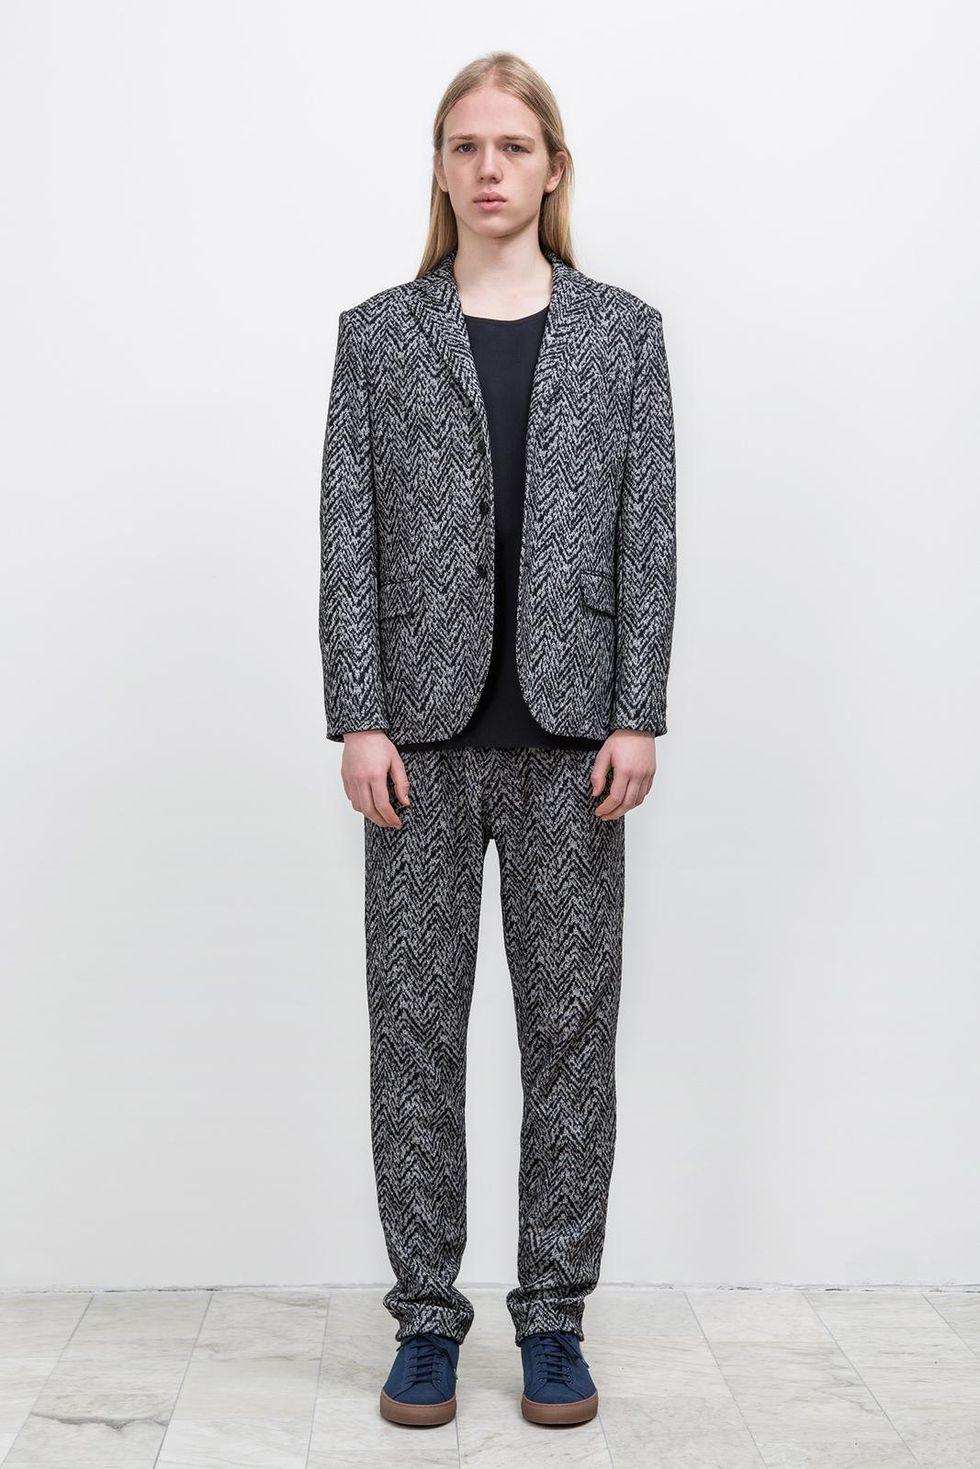 tres-bien-menswear-collection-spring-summer-2015-06.jpg